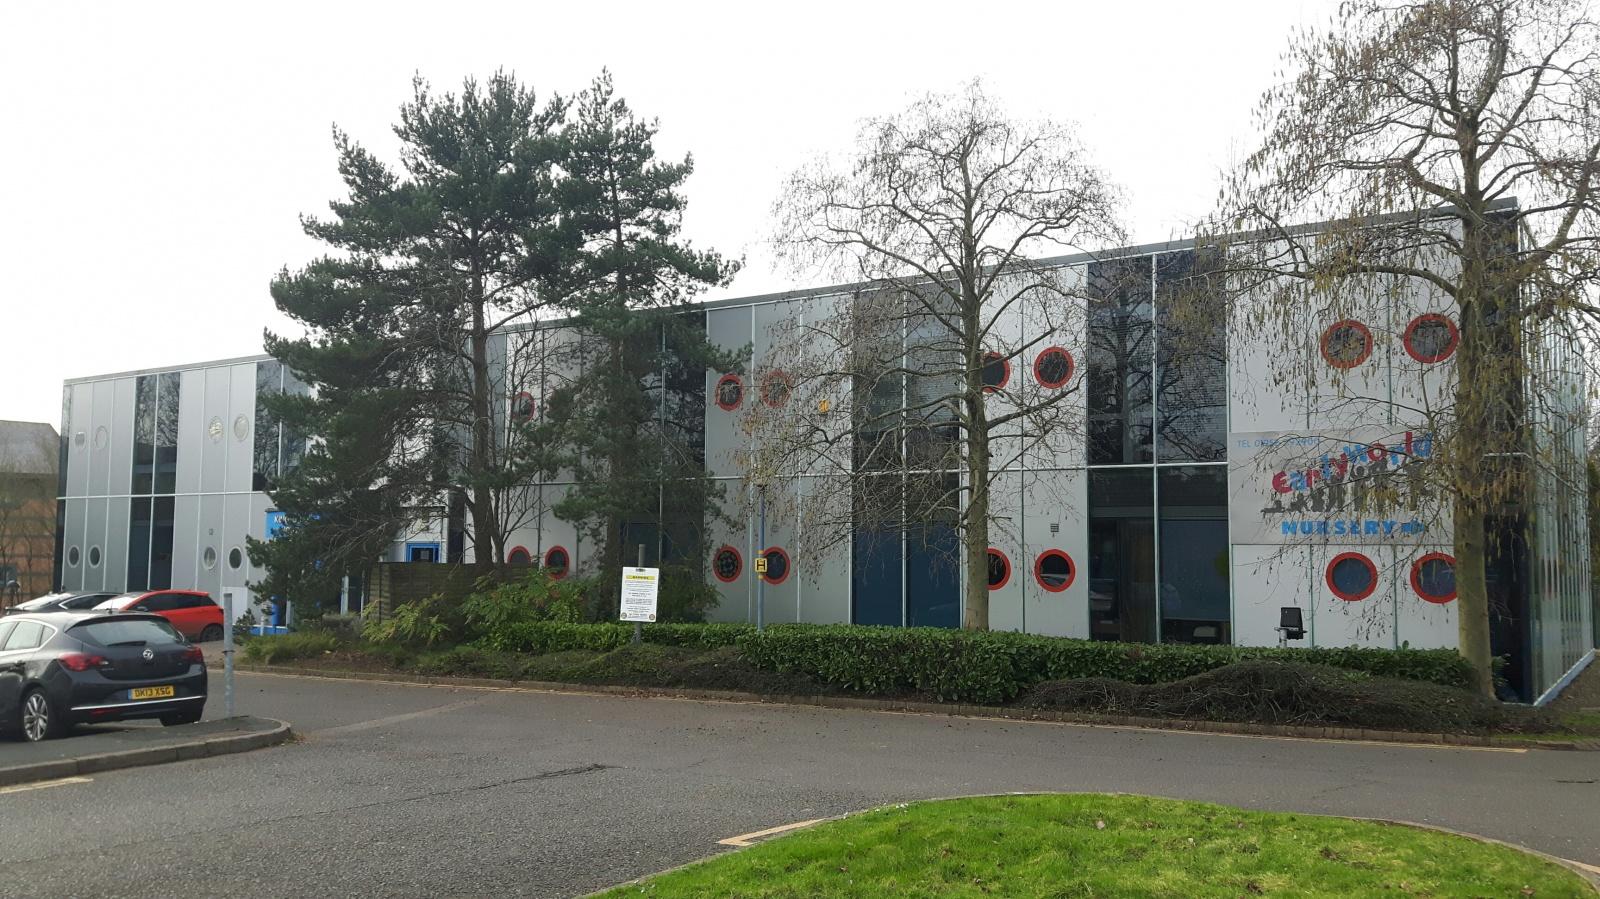 Suite 1 Kingsland House, Stafford Court, Telford, Shropshire